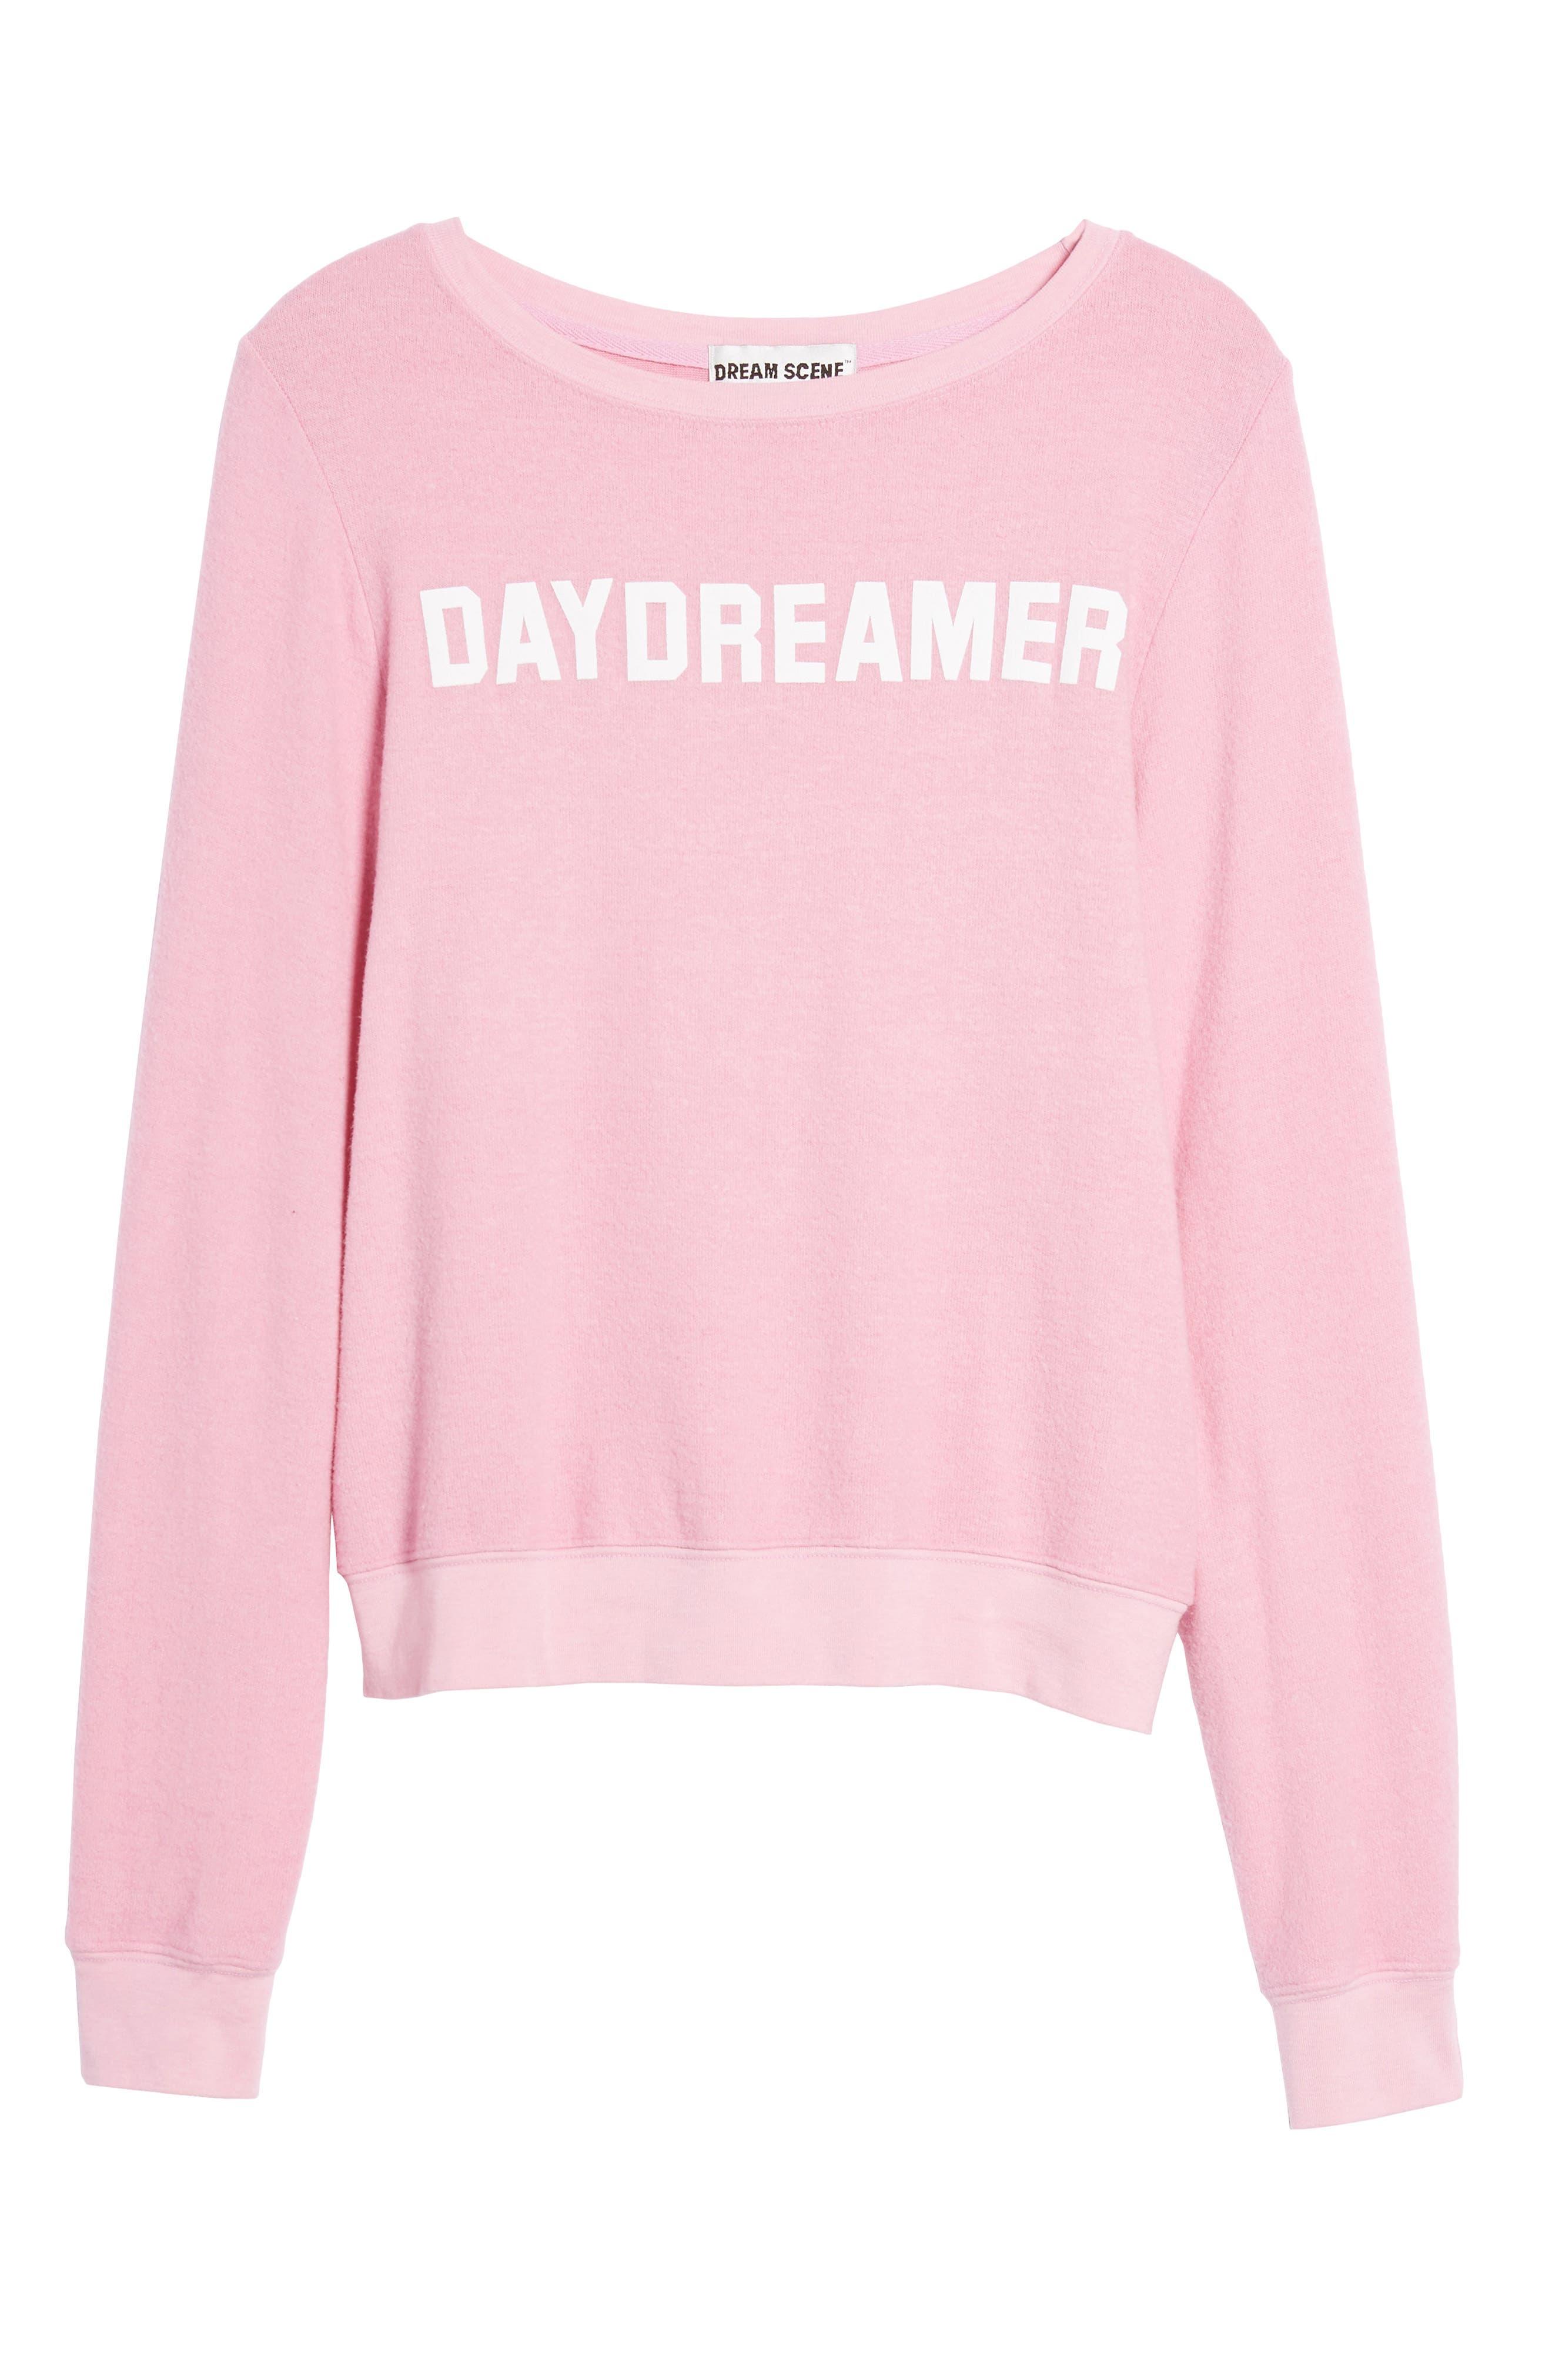 Daydreamer Sweatshirt,                             Alternate thumbnail 6, color,                             650